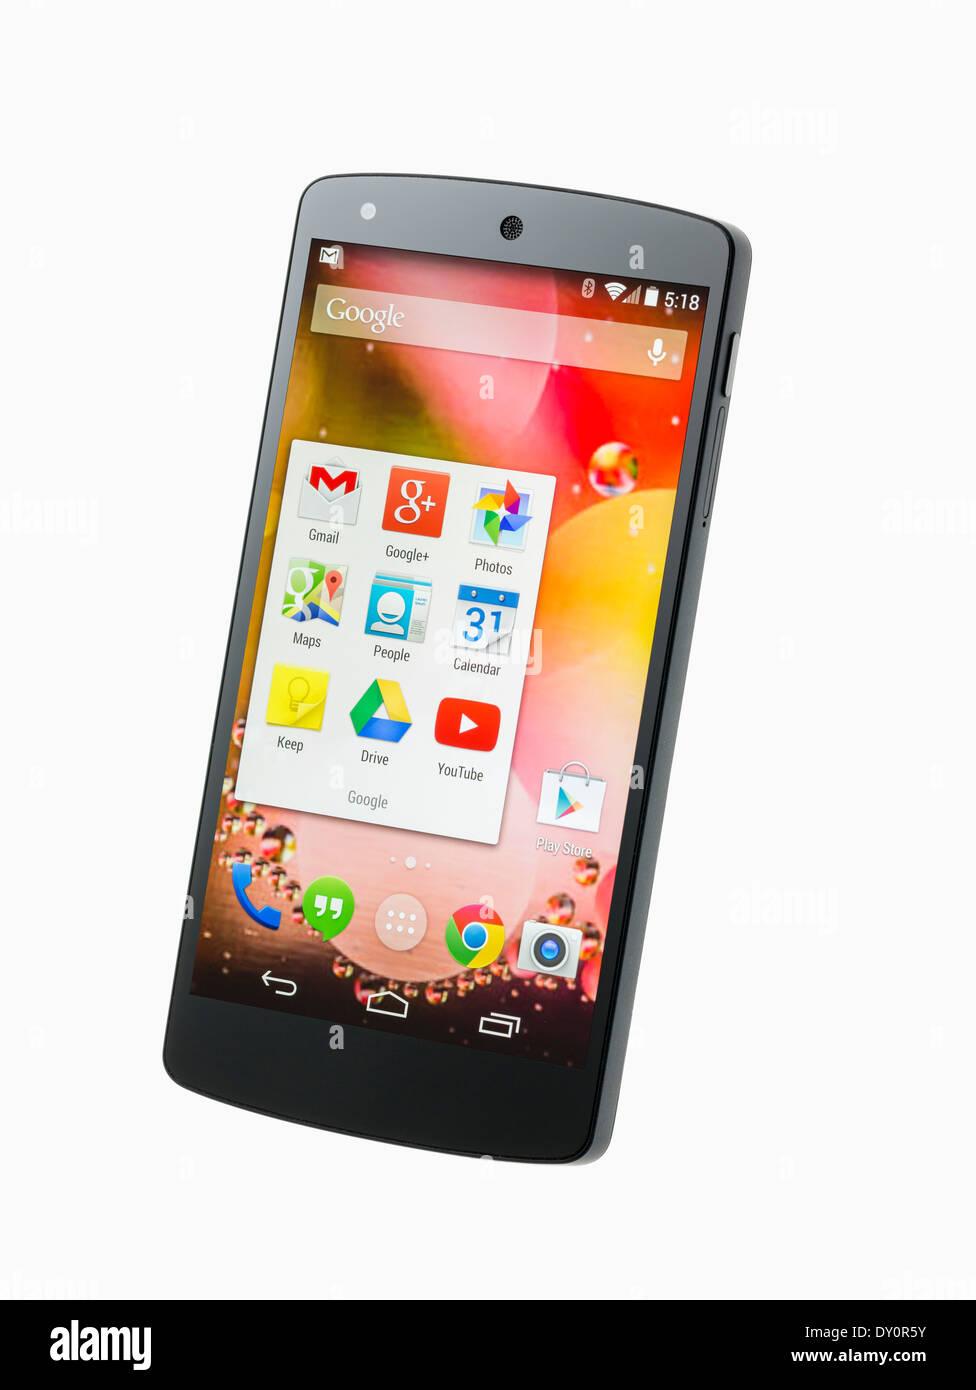 Google Nexus 5 Android Smartphone smart phone mobile phone Stockbild